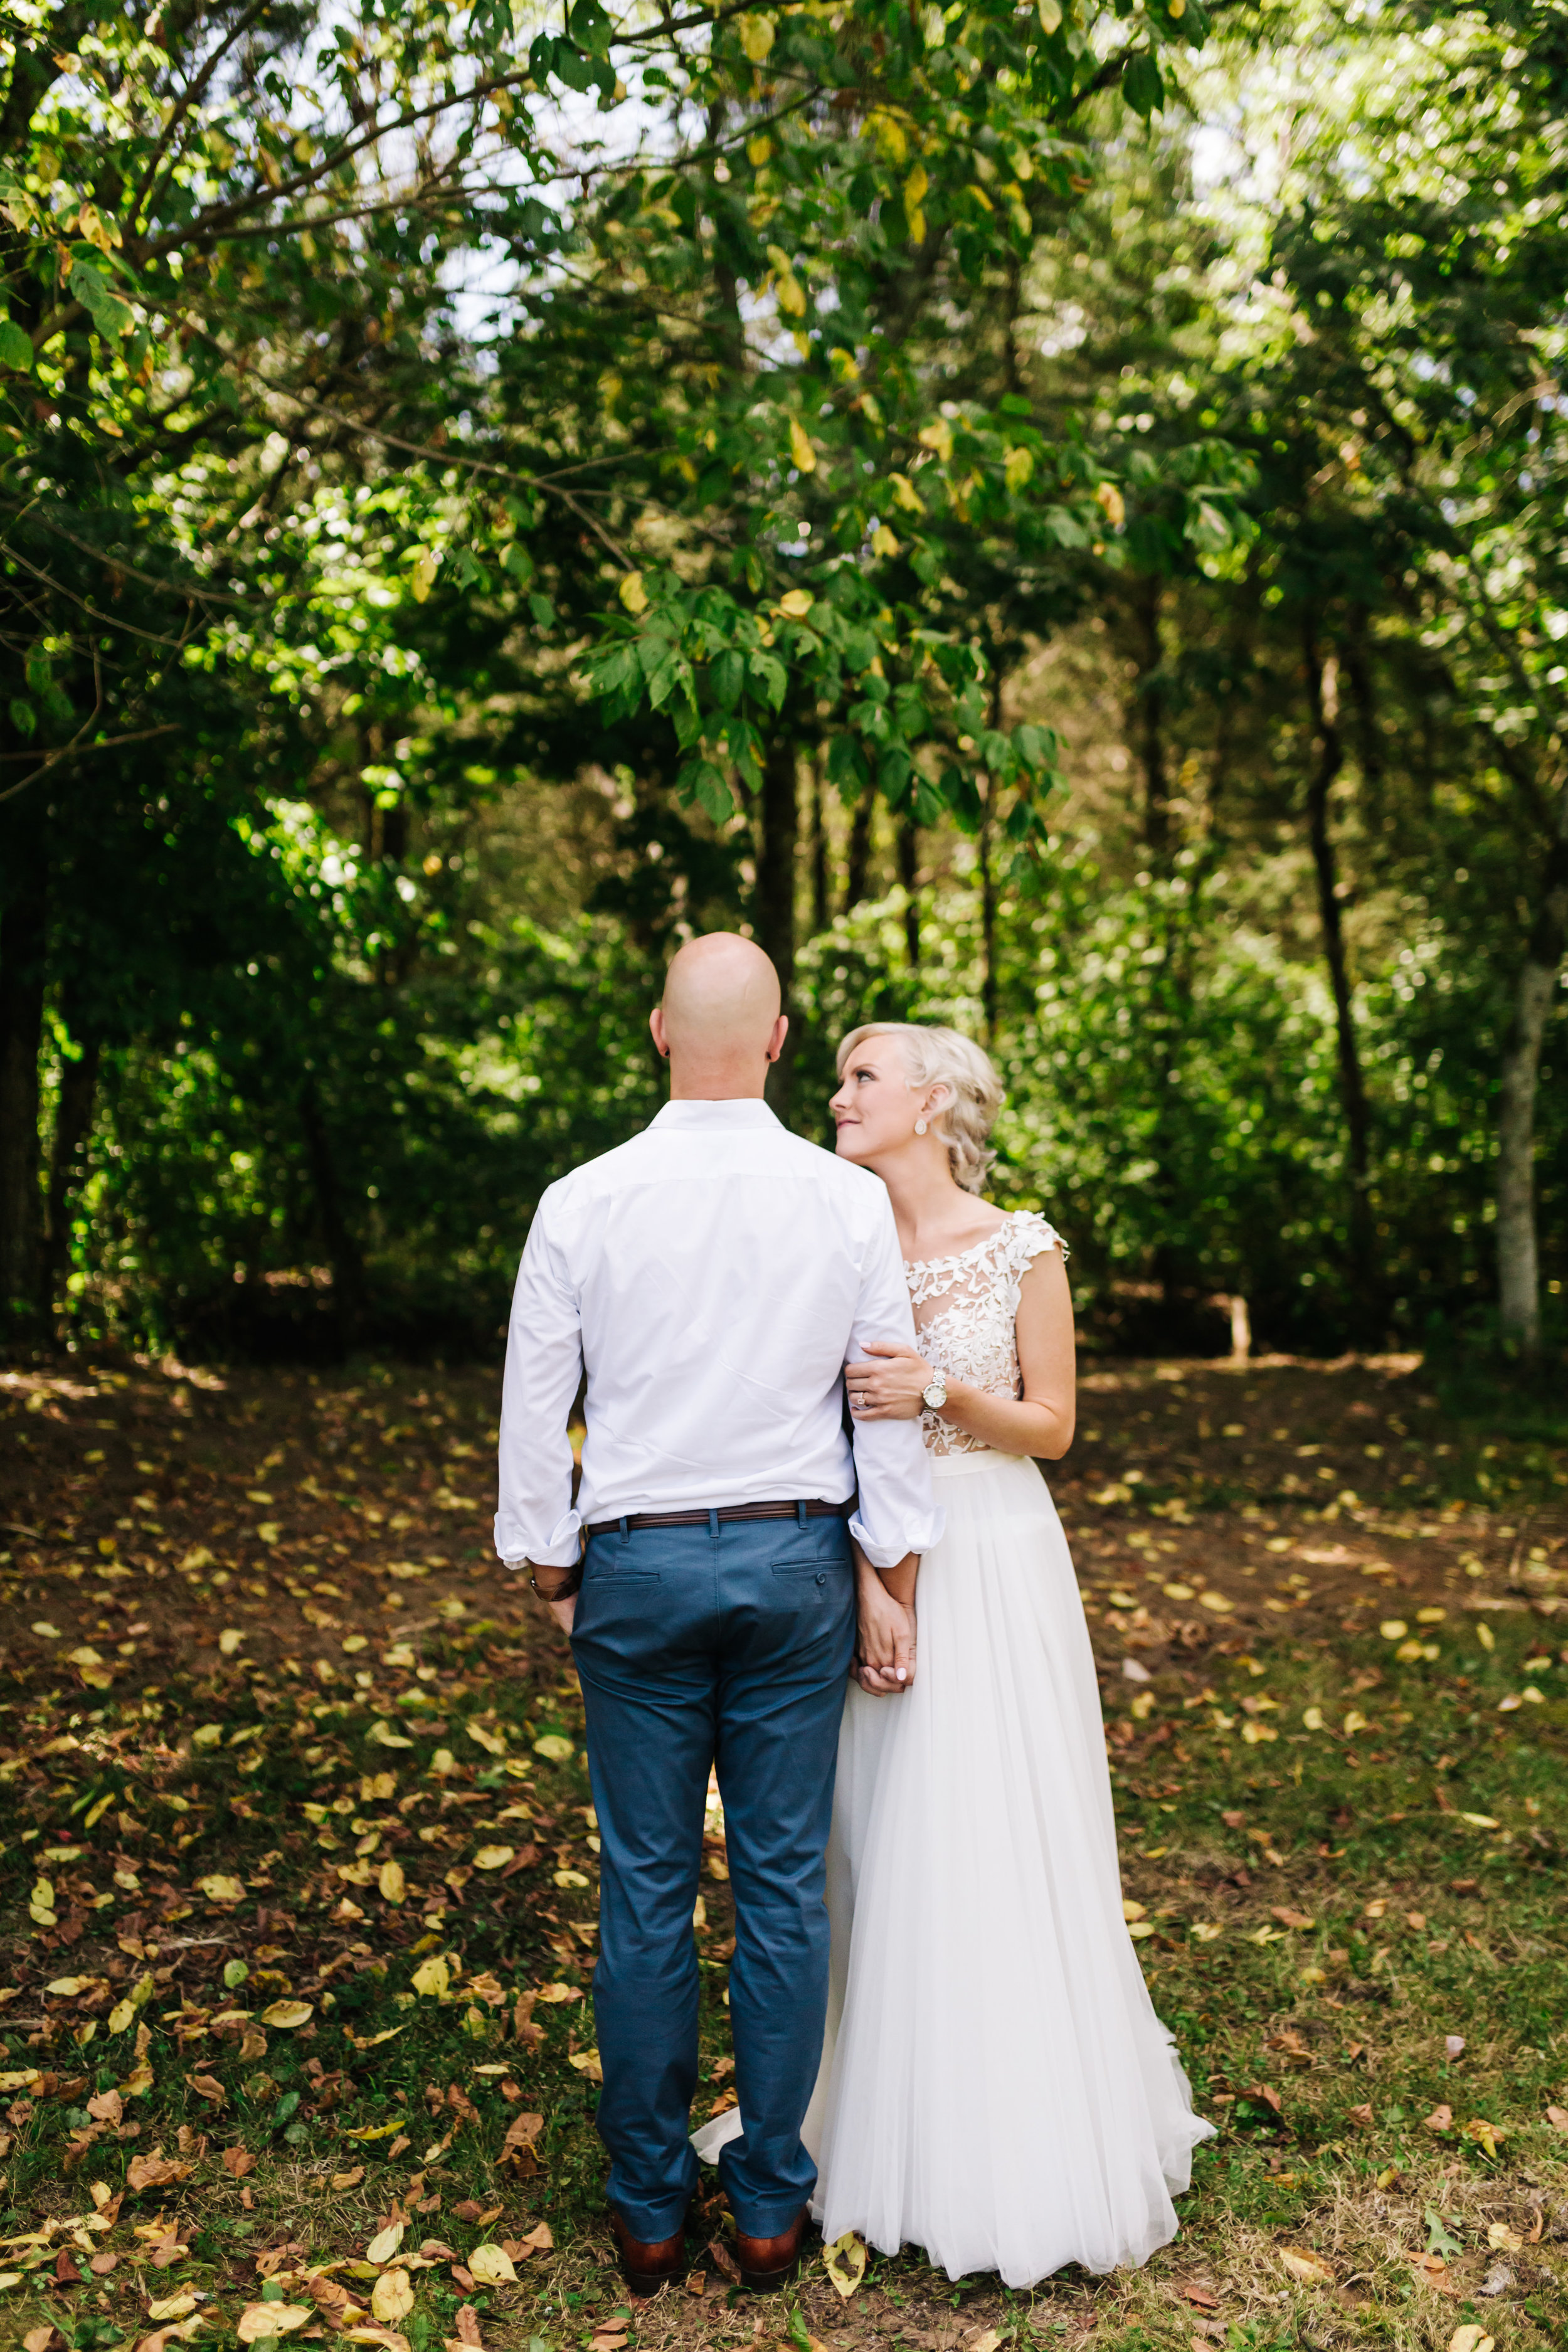 2018.09.02 Ray and Sarah Prizner Nashville TN Wedding FINALS-119.jpg